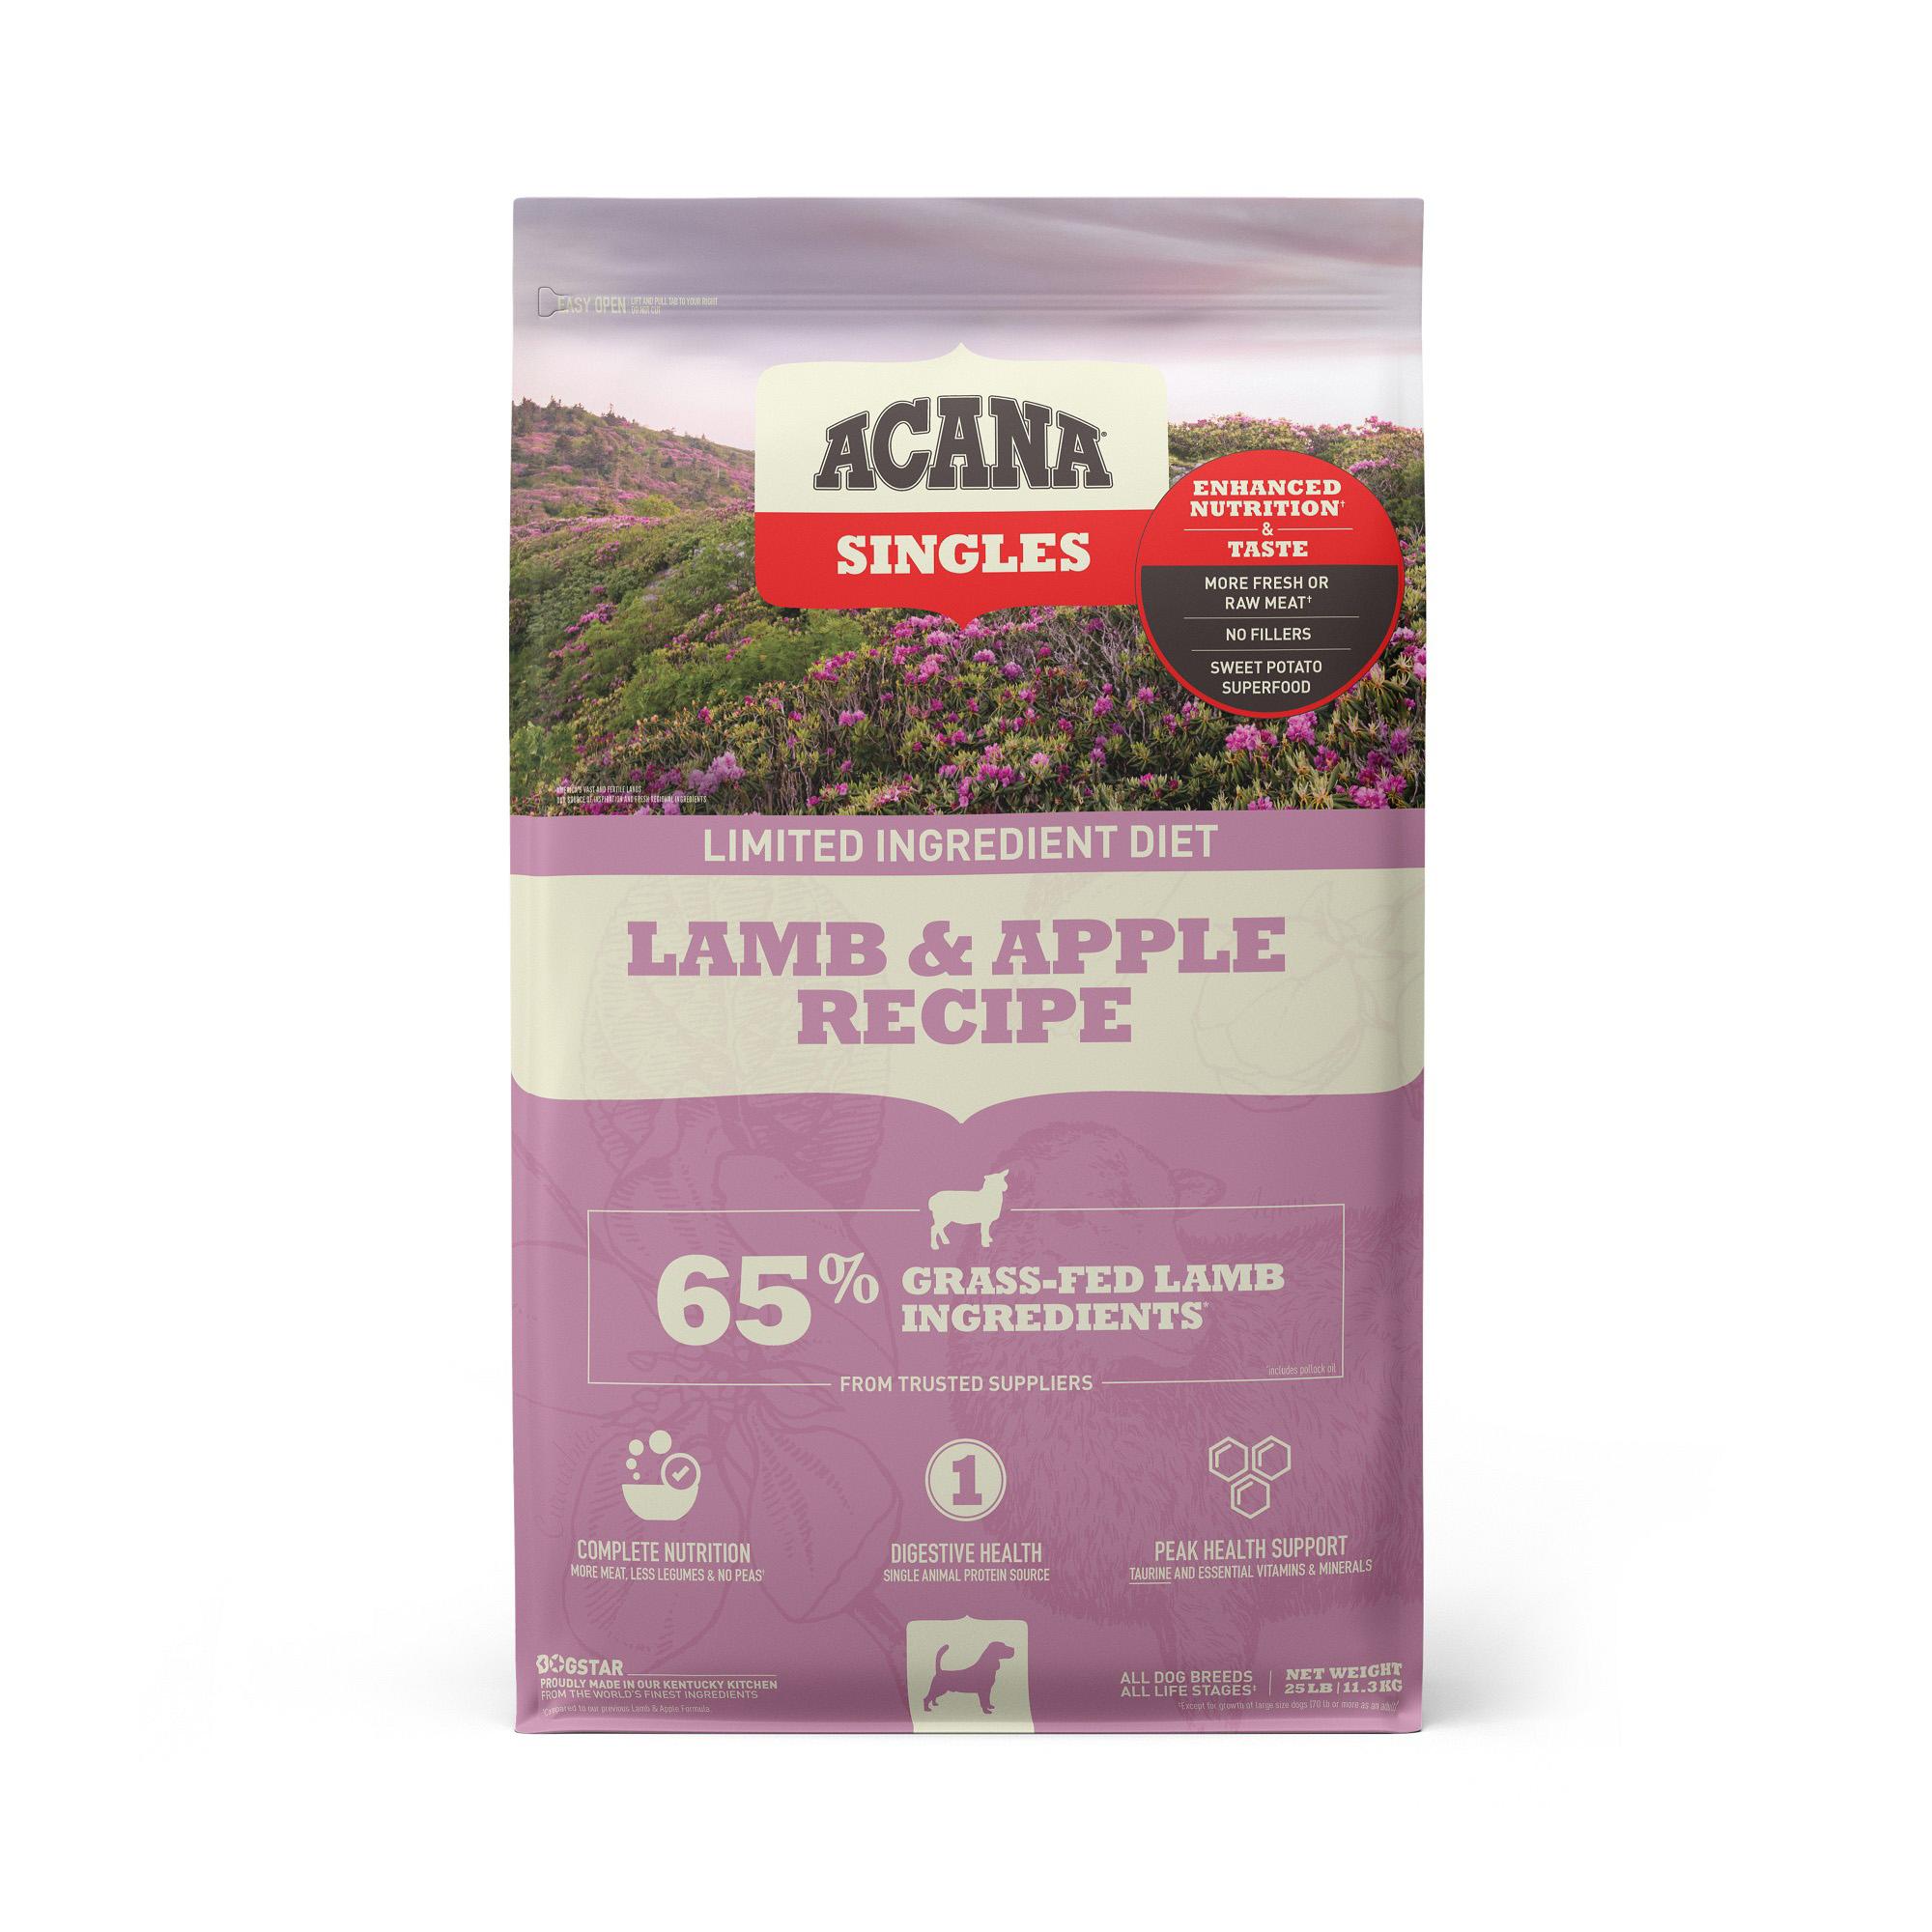 ACANA Singles Limited Ingredient Diet Lamb & Apple Recipe Dry Dog Food, 25-lb bag